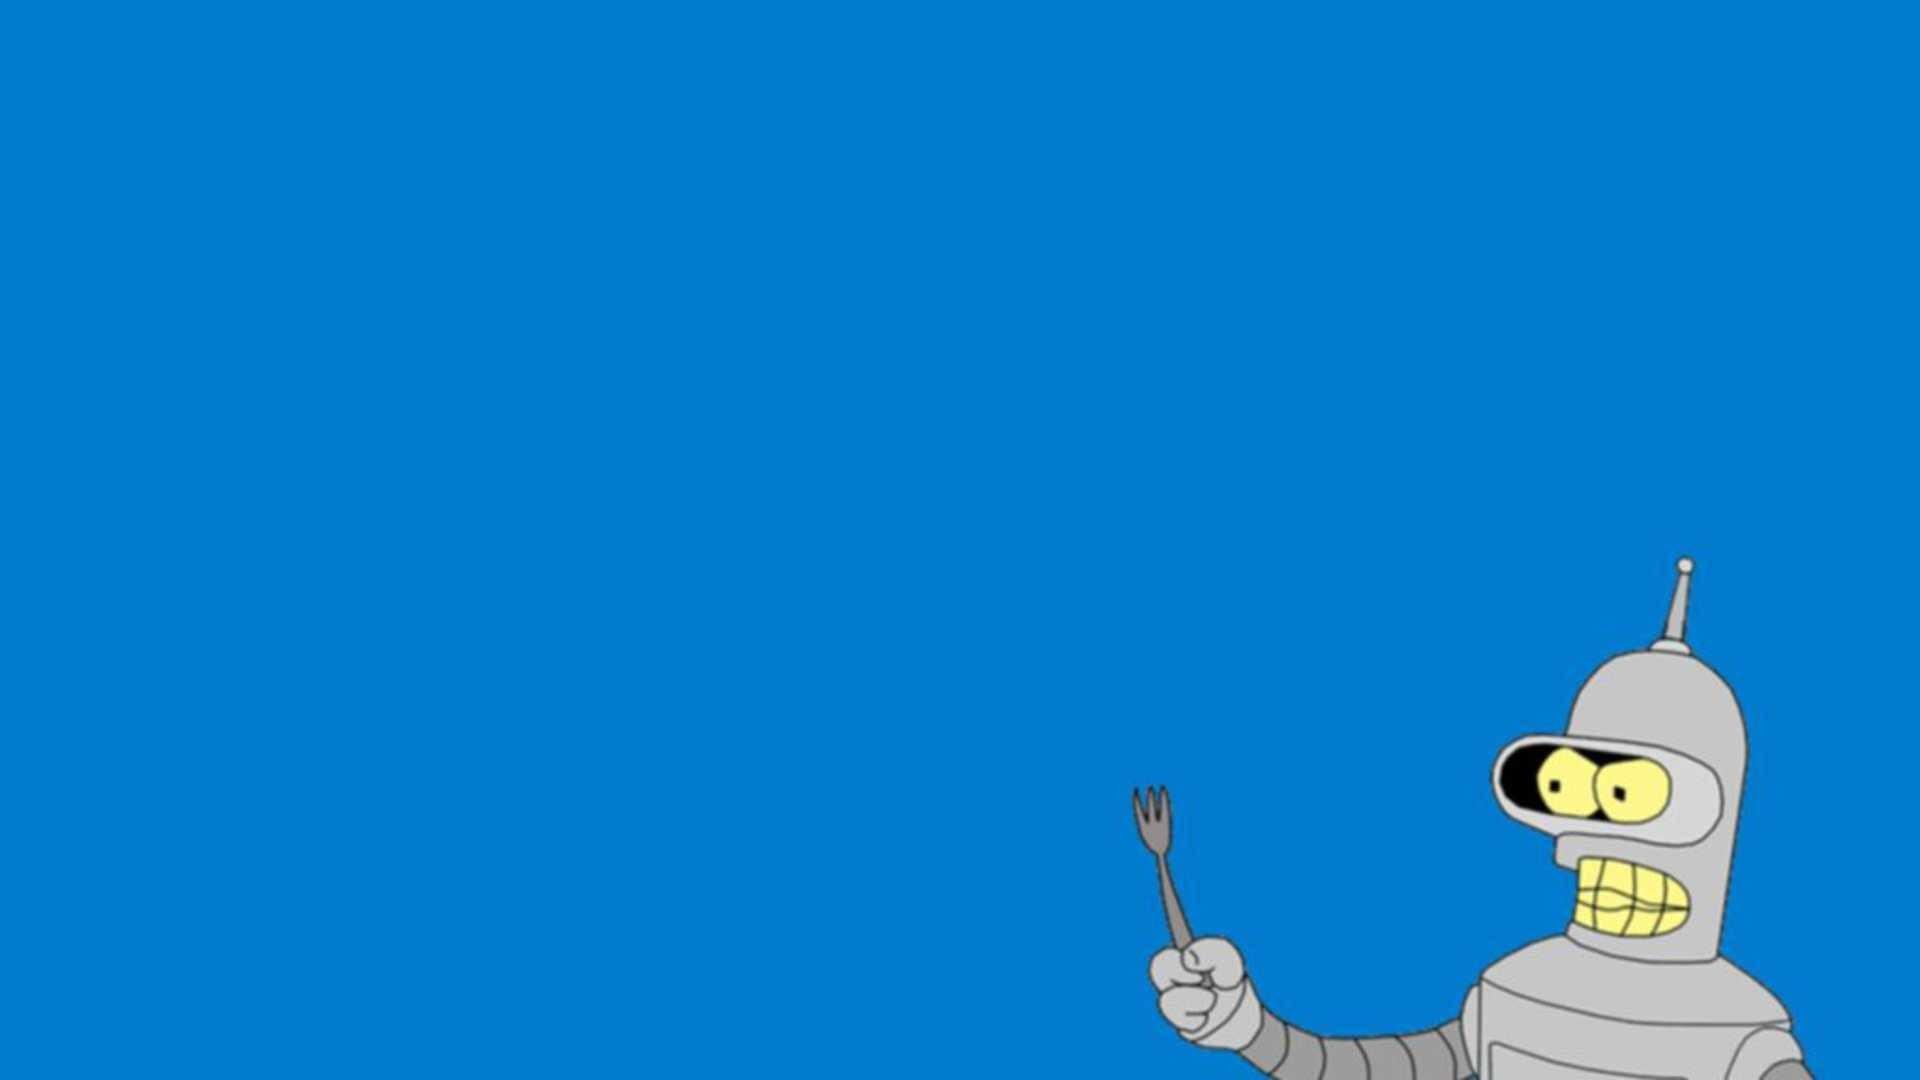 Futurama Bender Wallpaper Futurama, Bender, Fun, Art